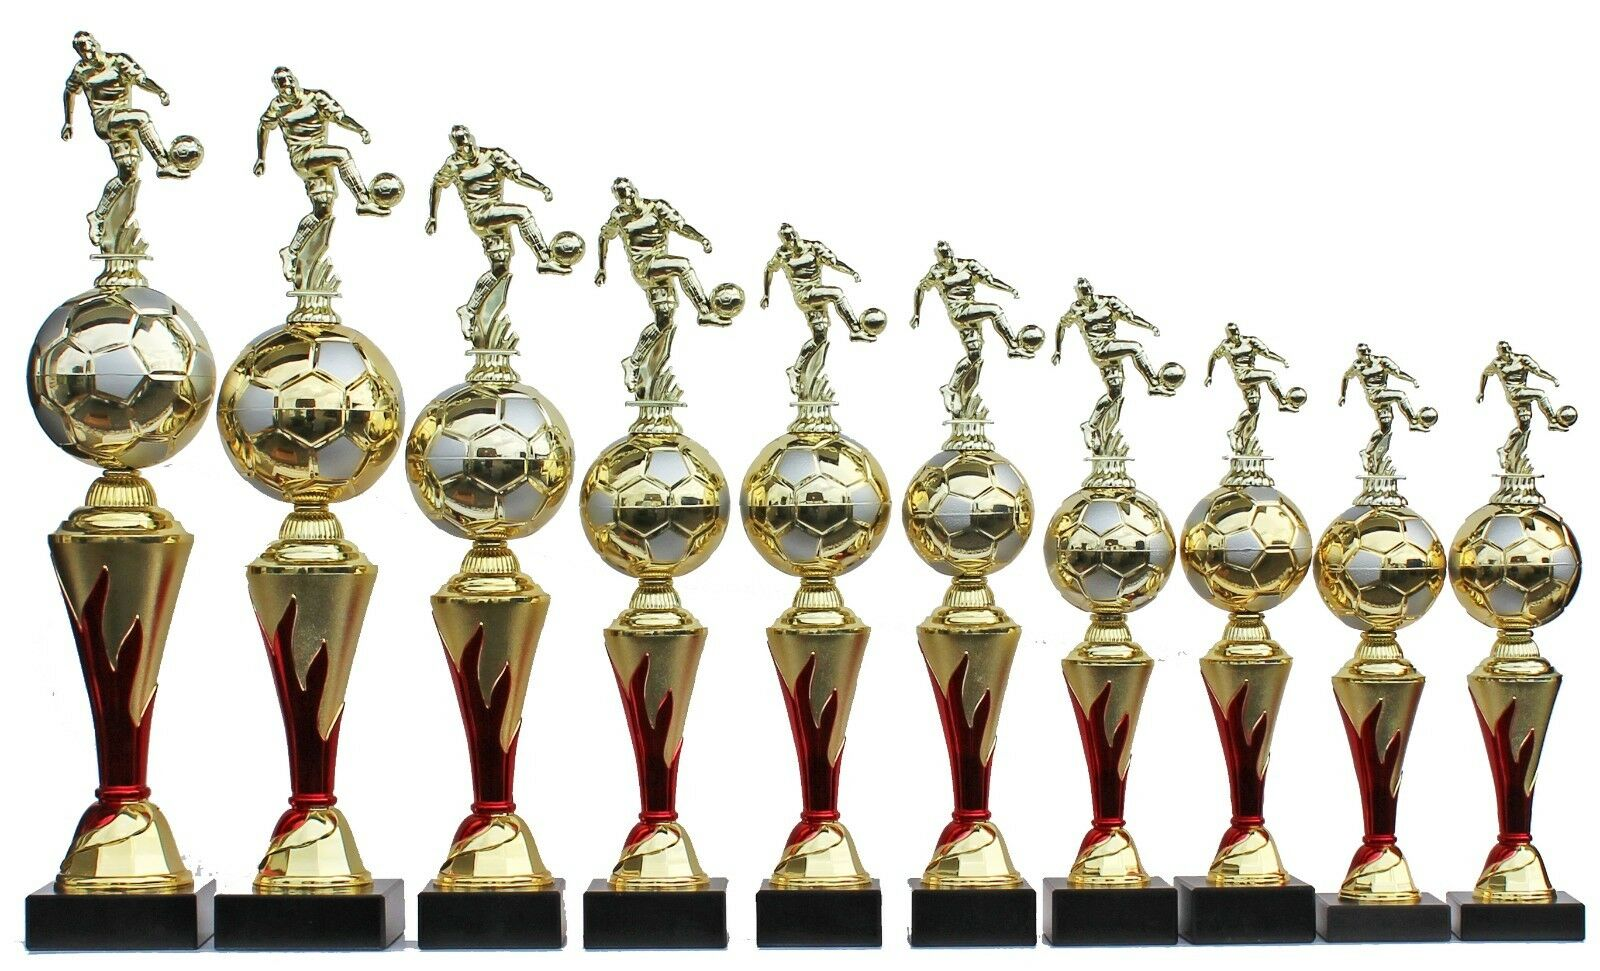 10er-serie trofeo trofeos fútbol figuras  on fire 2.0  incl. gravures